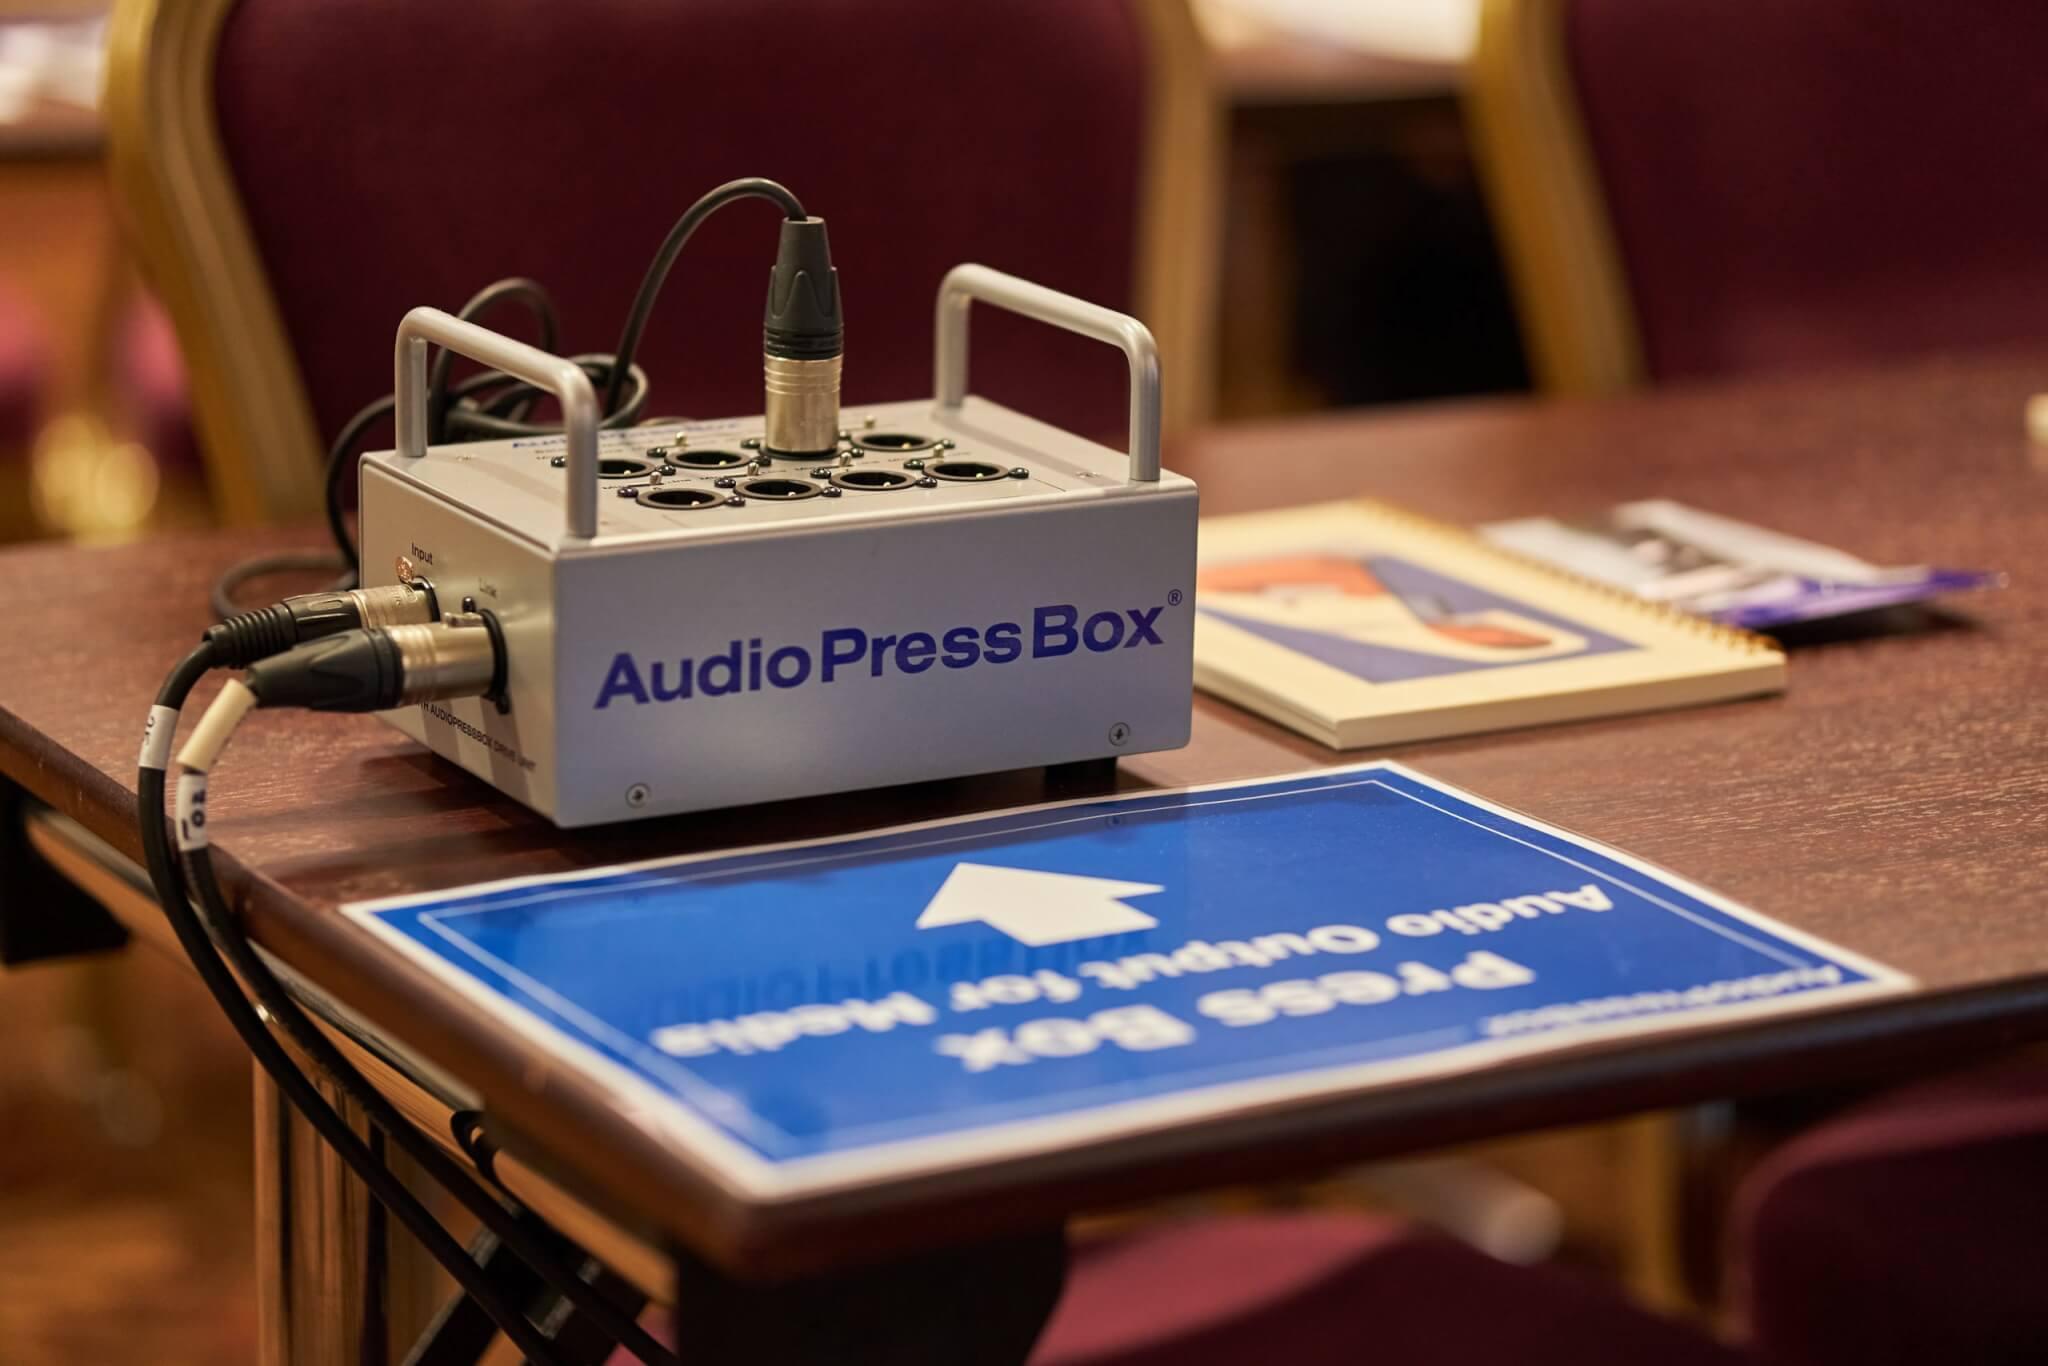 AudioPressBox-press-conference